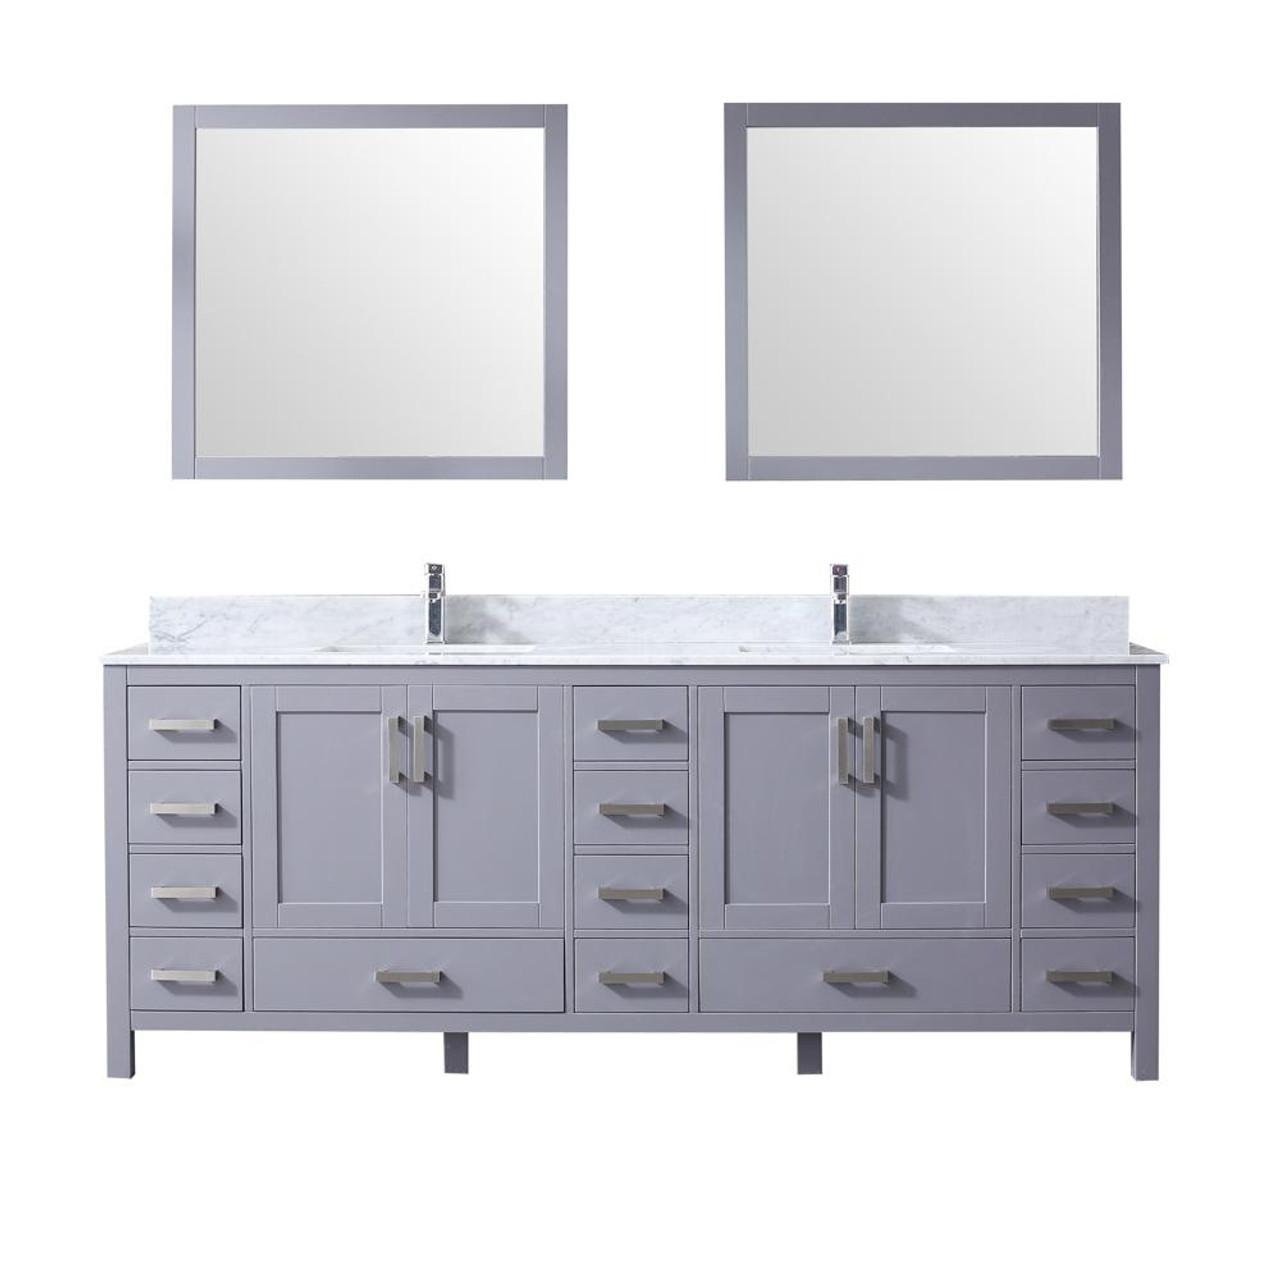 Key West 84 Double Bath Vanity In Grey W Quartz Top White Ceramic Sinks Royal Bath Place